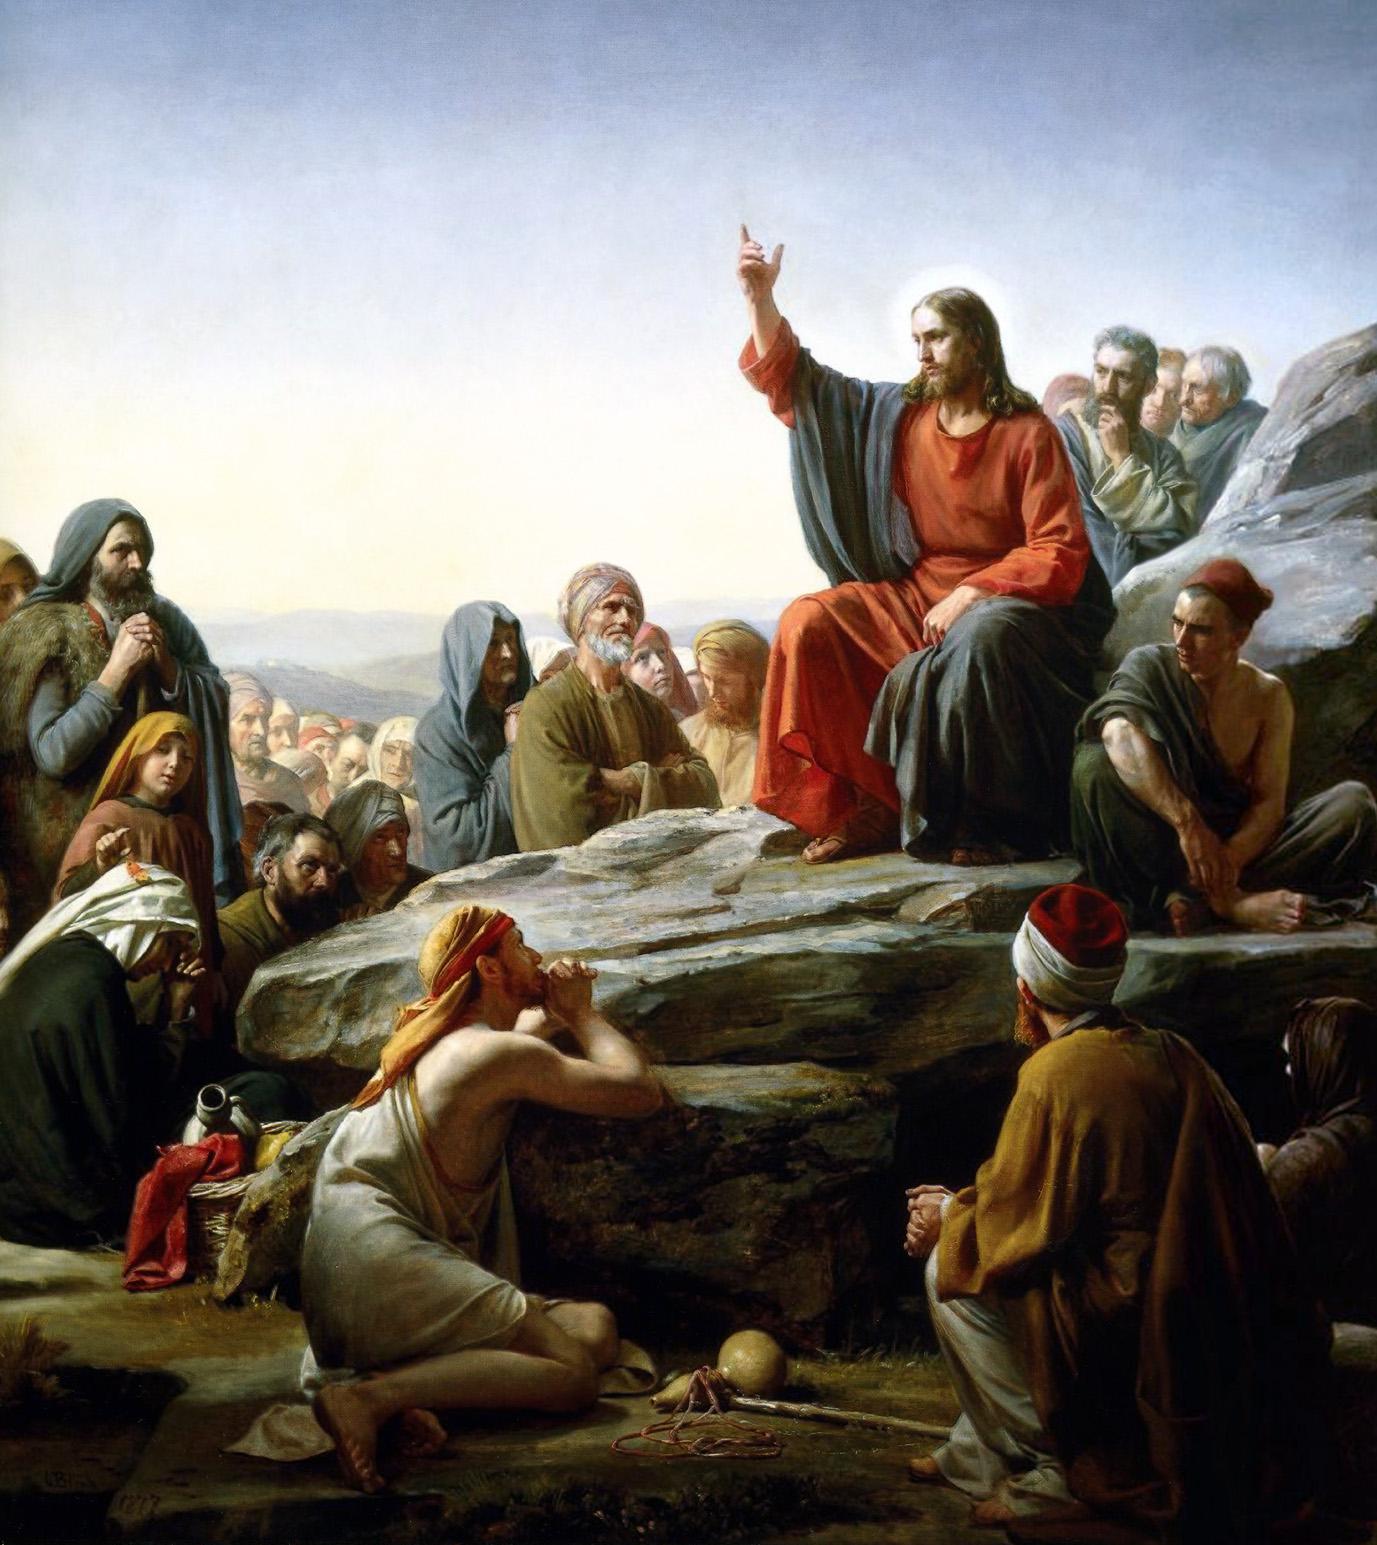 sermon on the mount Sermon on the mount commentaries matthew 7:28-29 jesus teaches with authority matthew 7:28 matthew 7:29  sermon on the mount study guide: matthew 5-7.